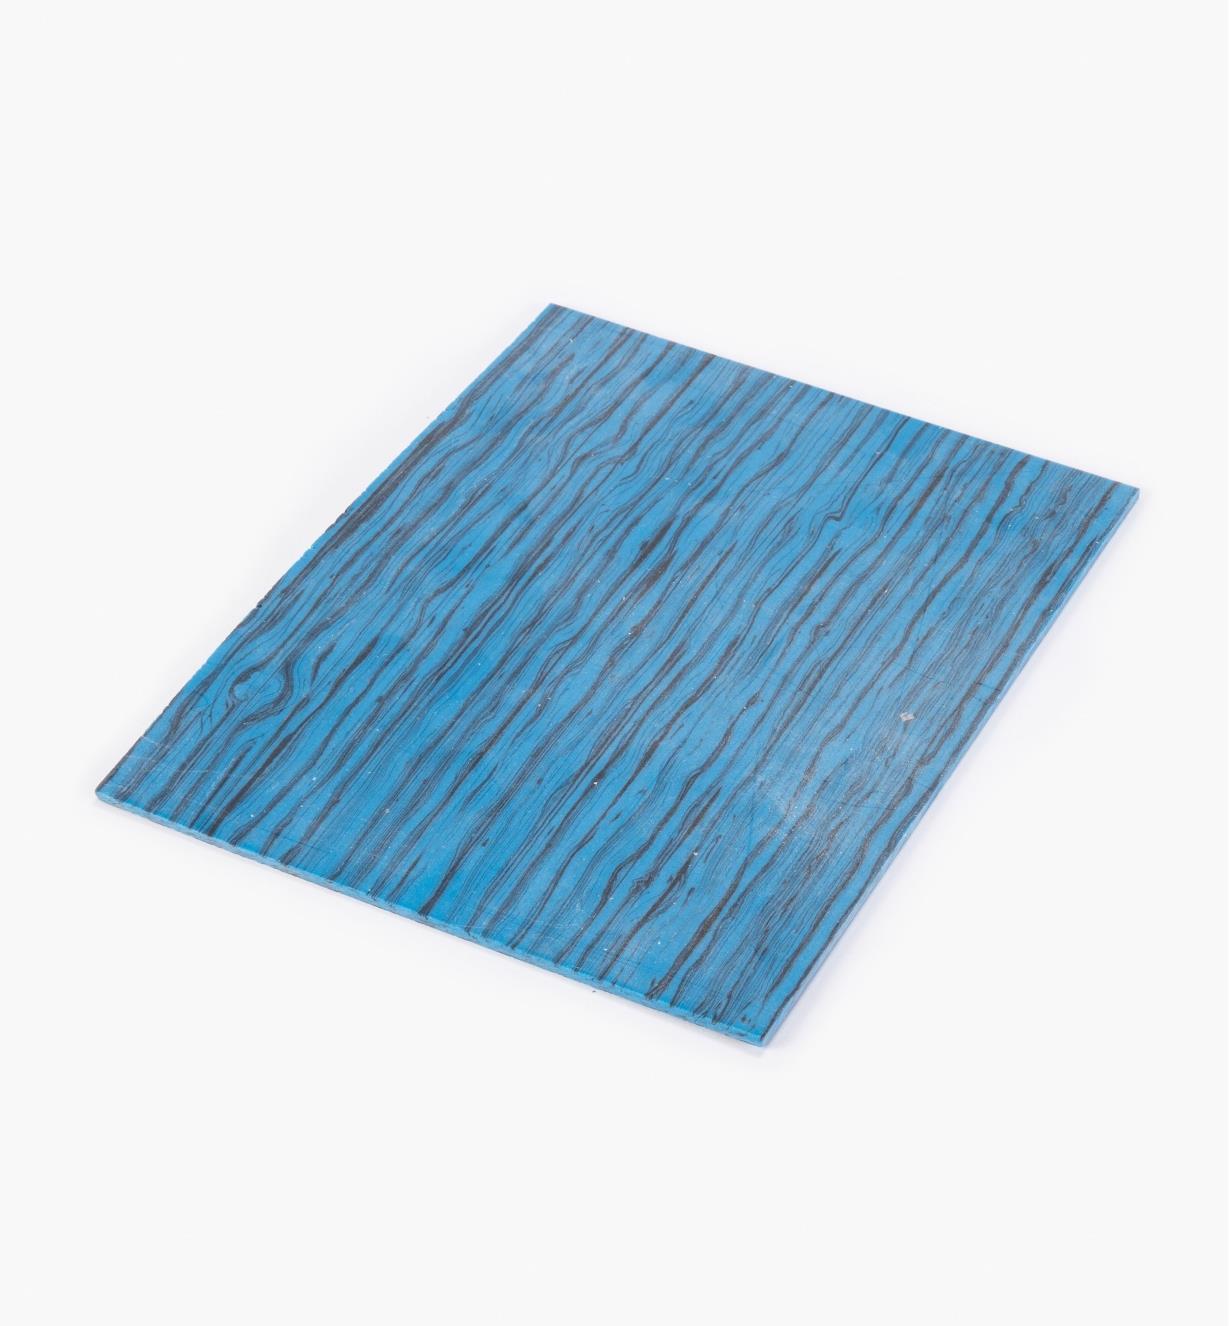 87K2106 - Simulated Cobalt Sheet, 23cm x 28cm x 3mm